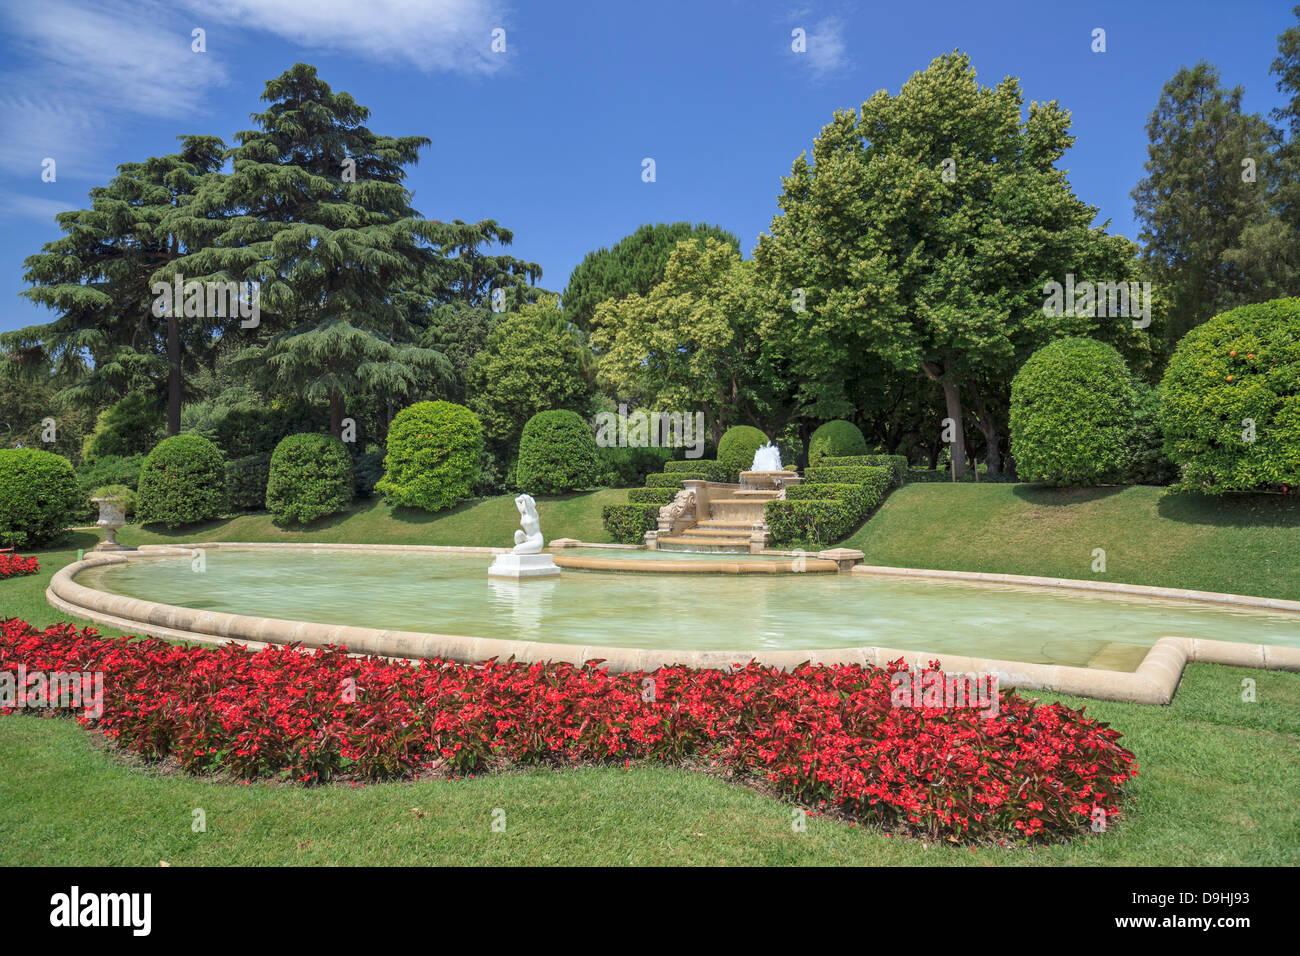 Garden in Palau Reial de Pedralbes,Barcelona - Stock Image